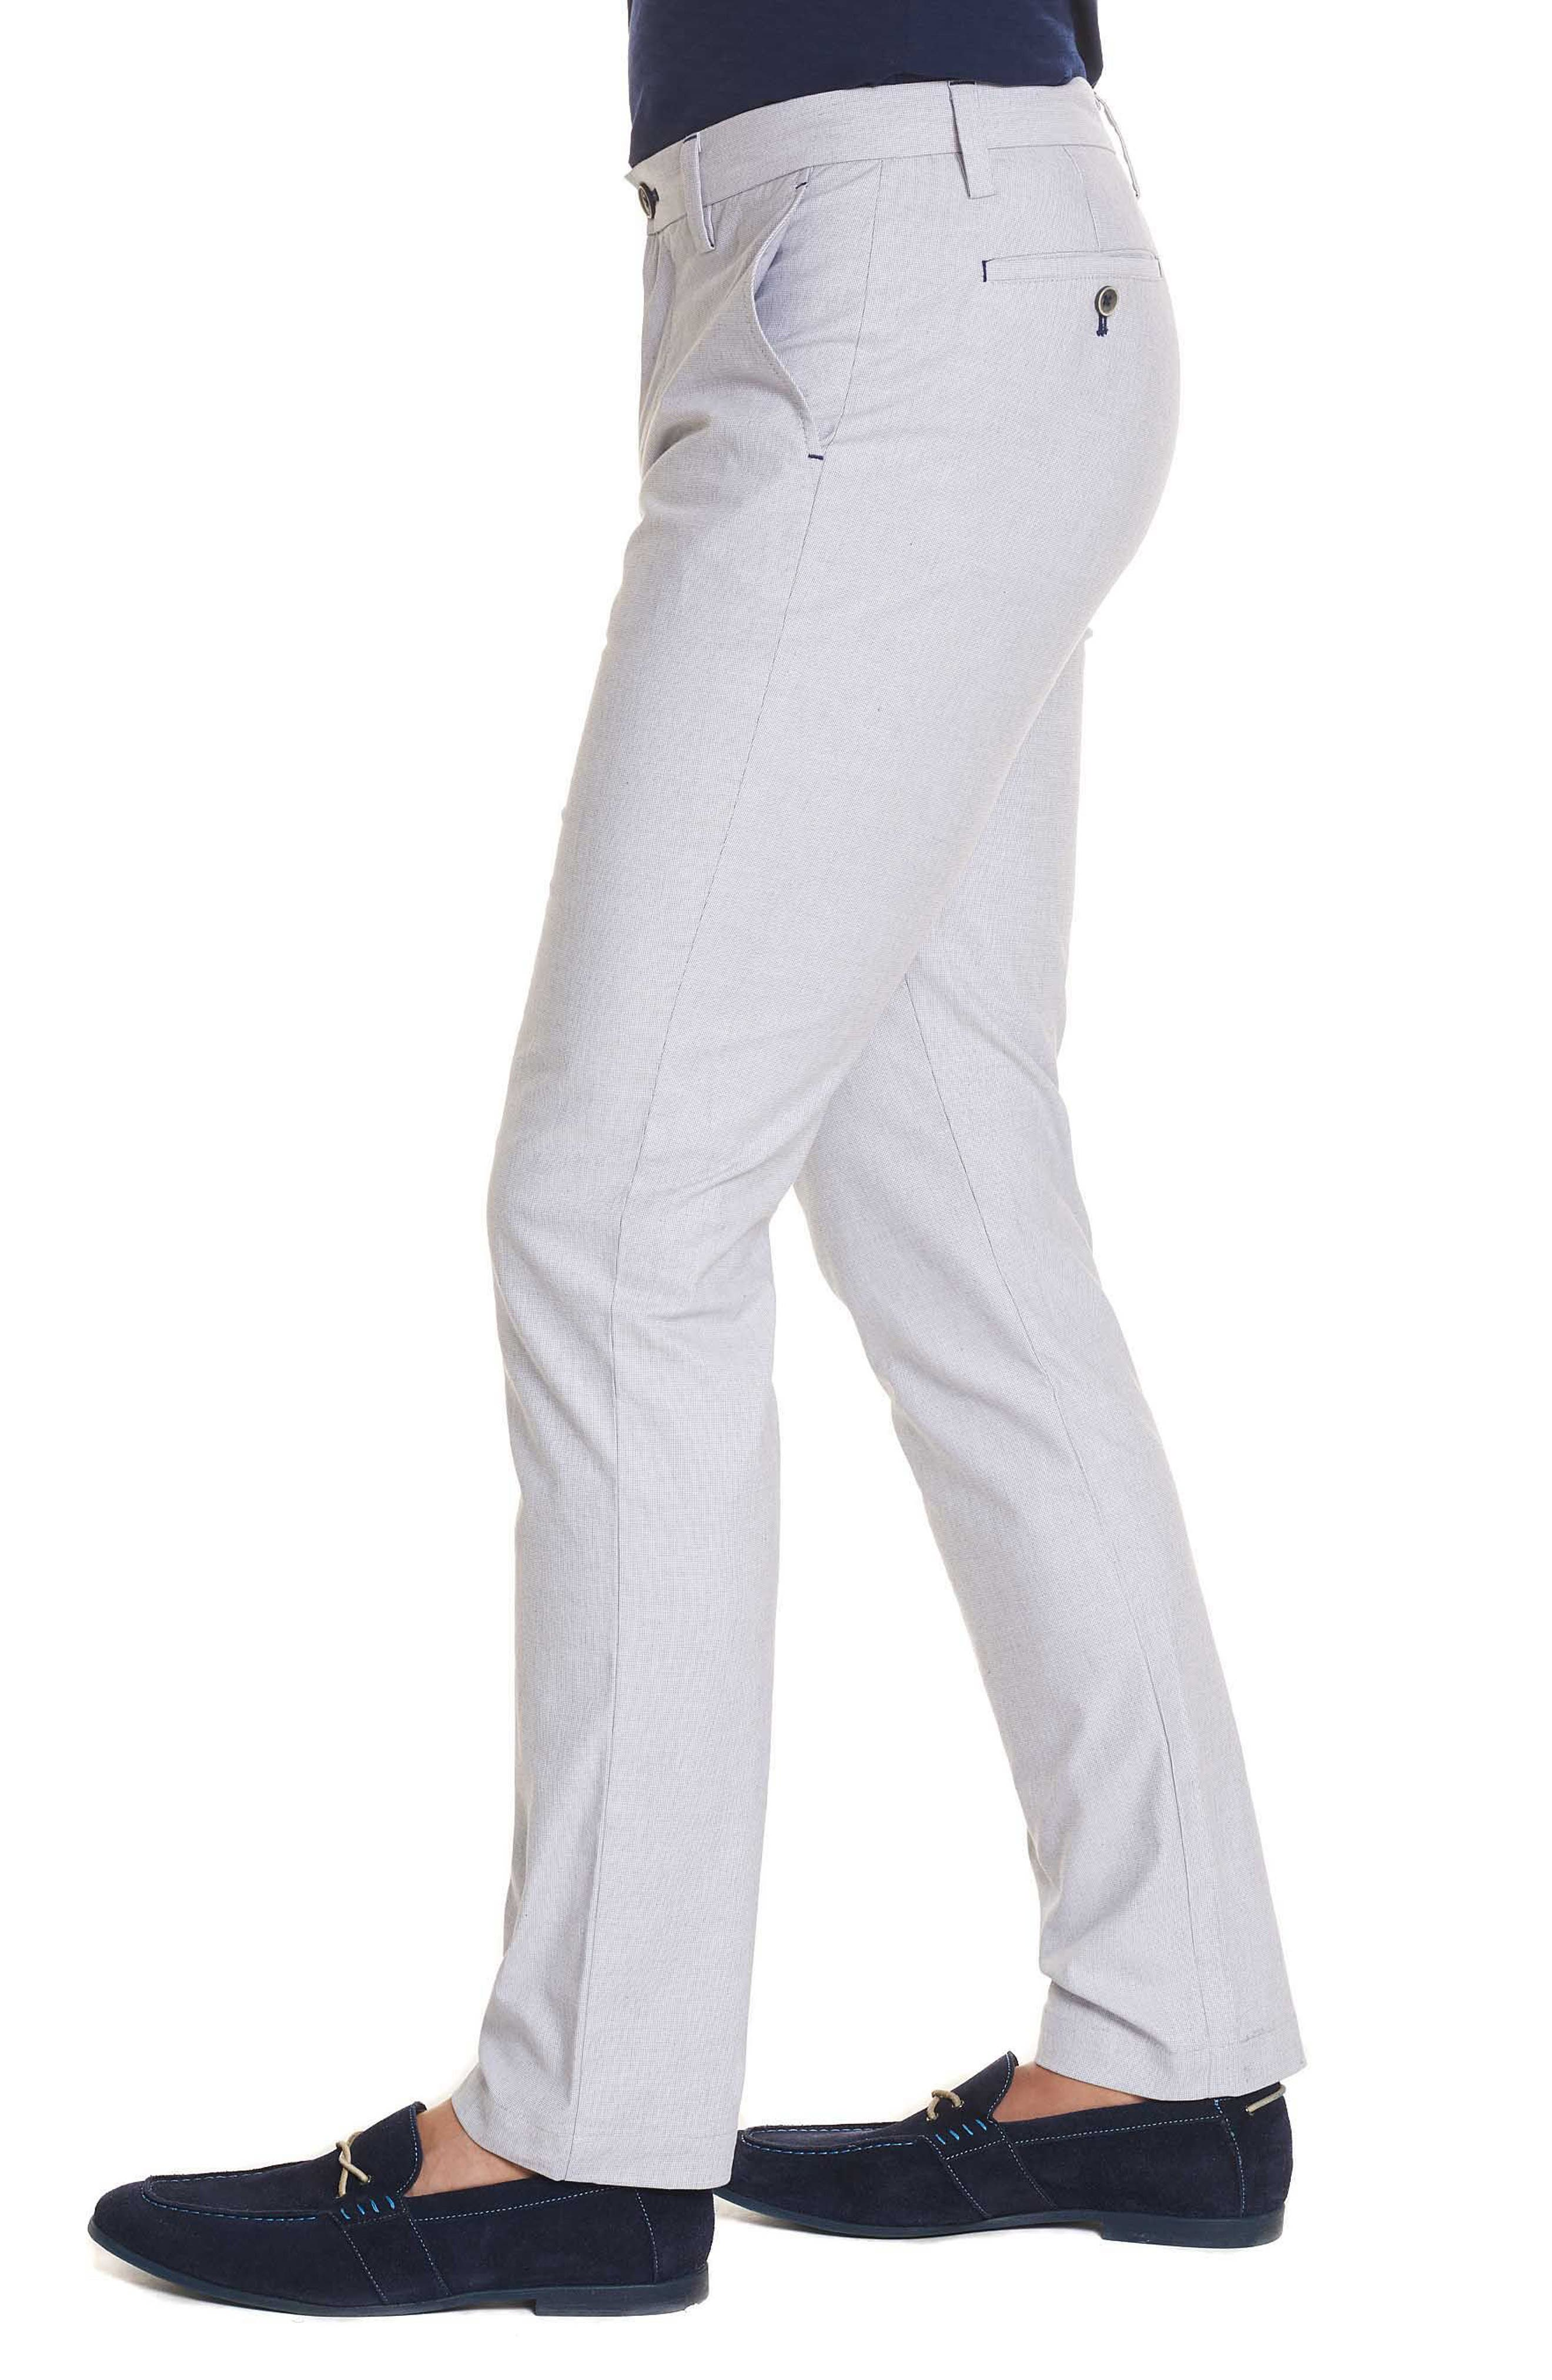 Gerardo Tailored Fit Pants,                             Alternate thumbnail 3, color,                             100